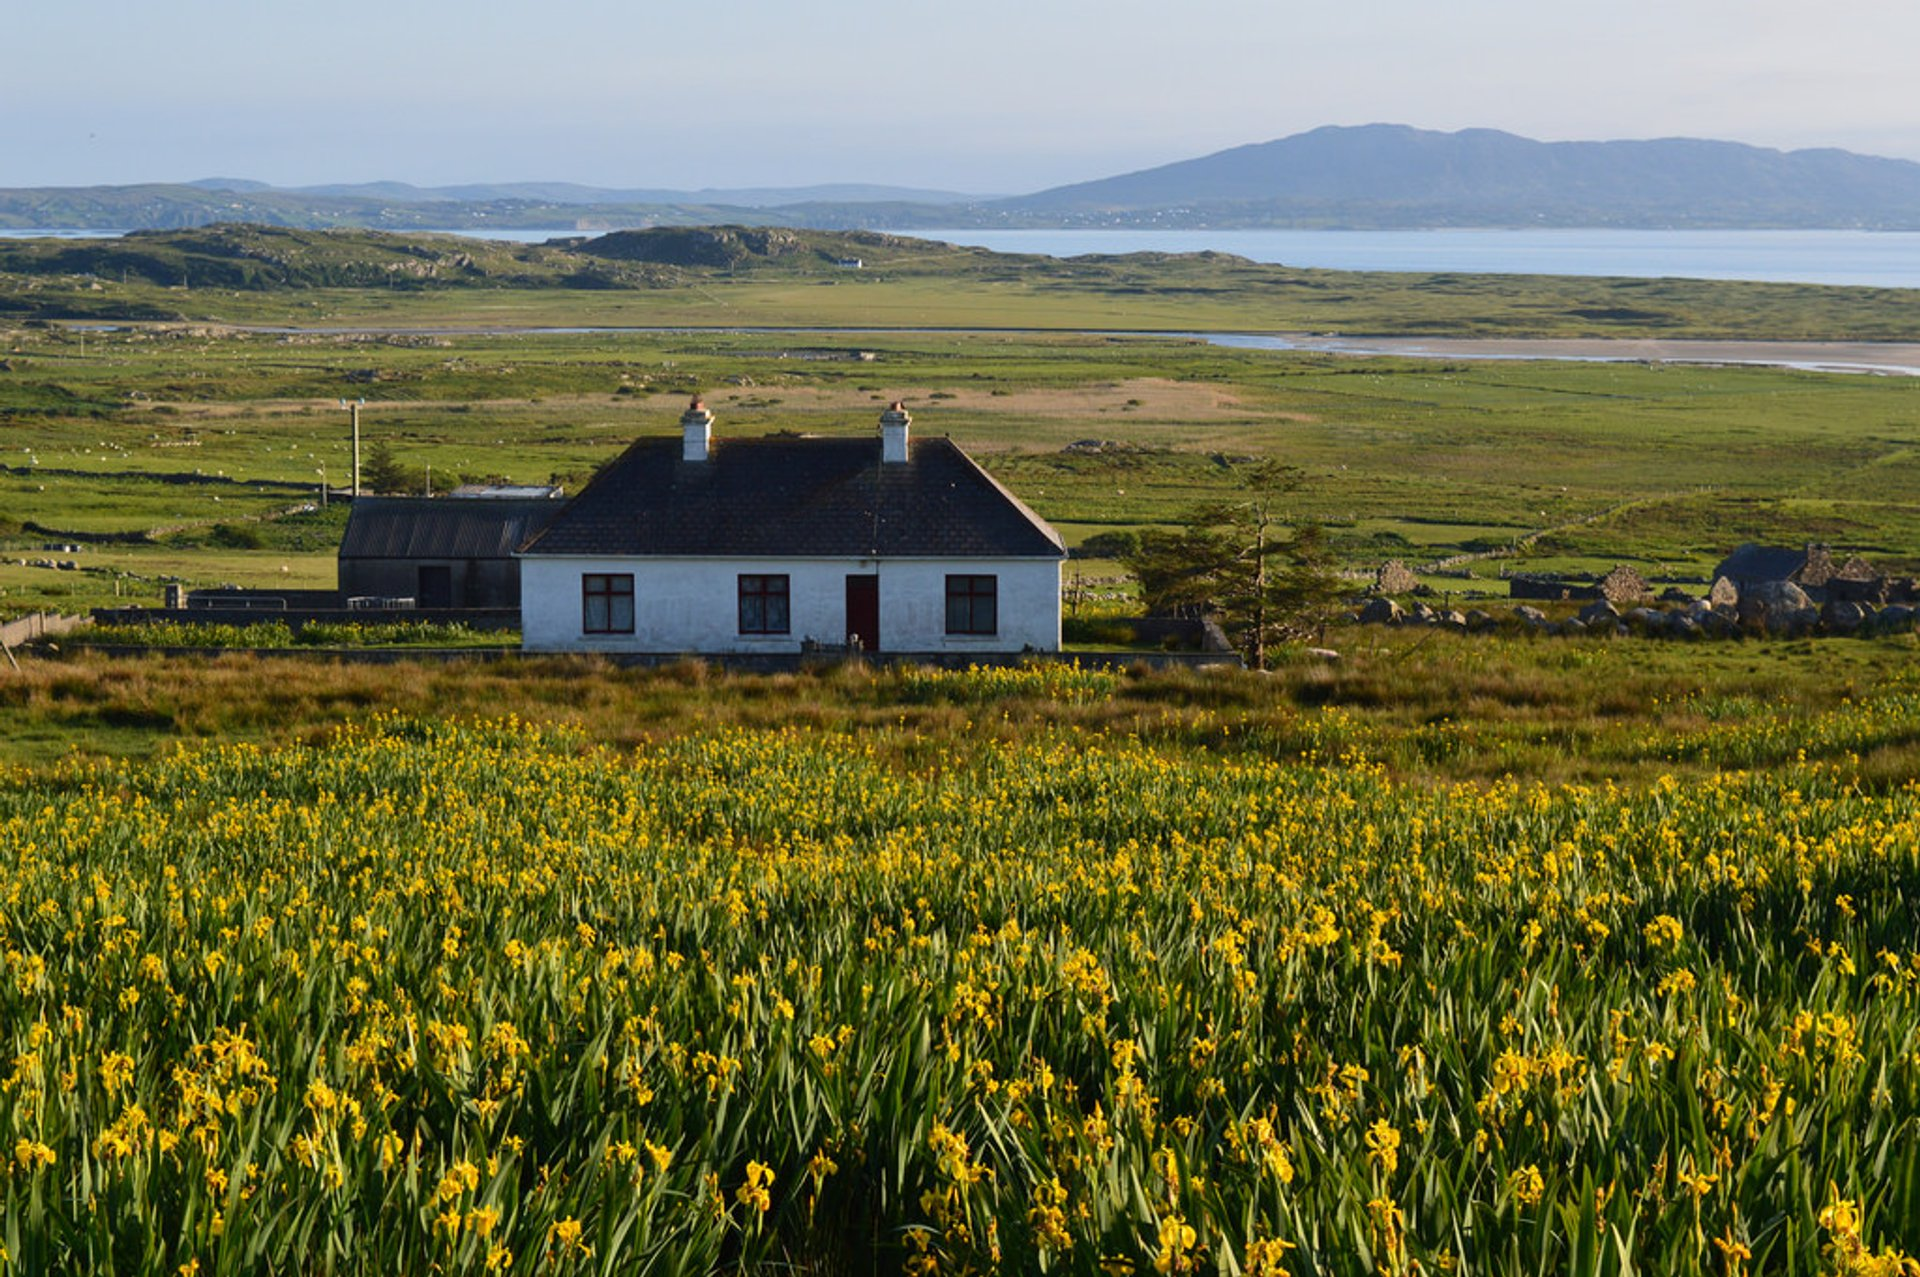 Spring in Ireland 2020 - Best Time